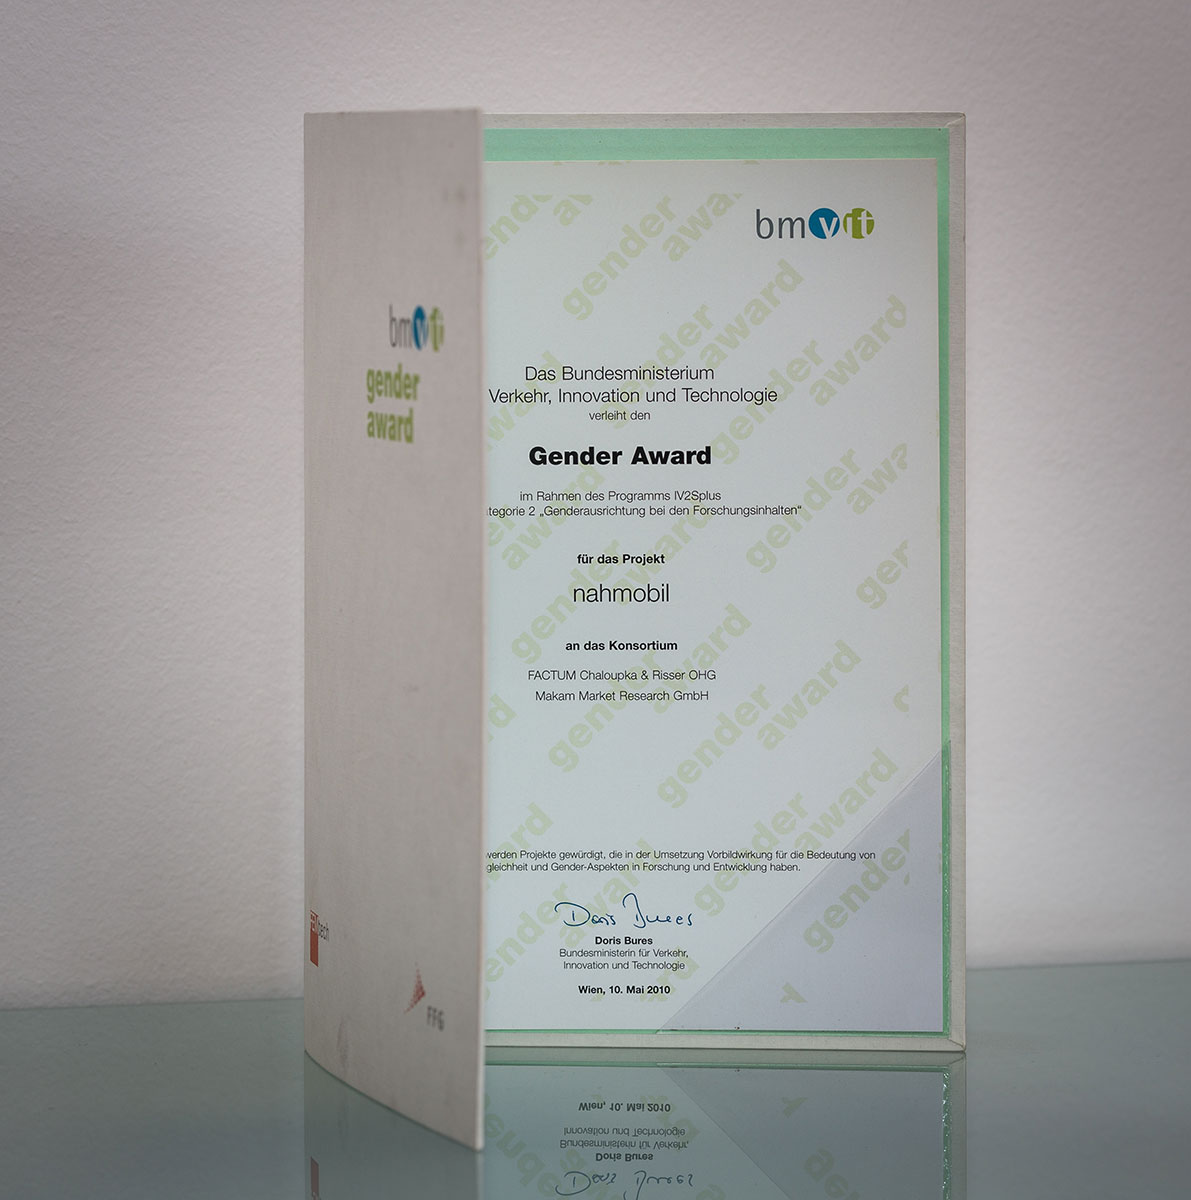 Gender Award